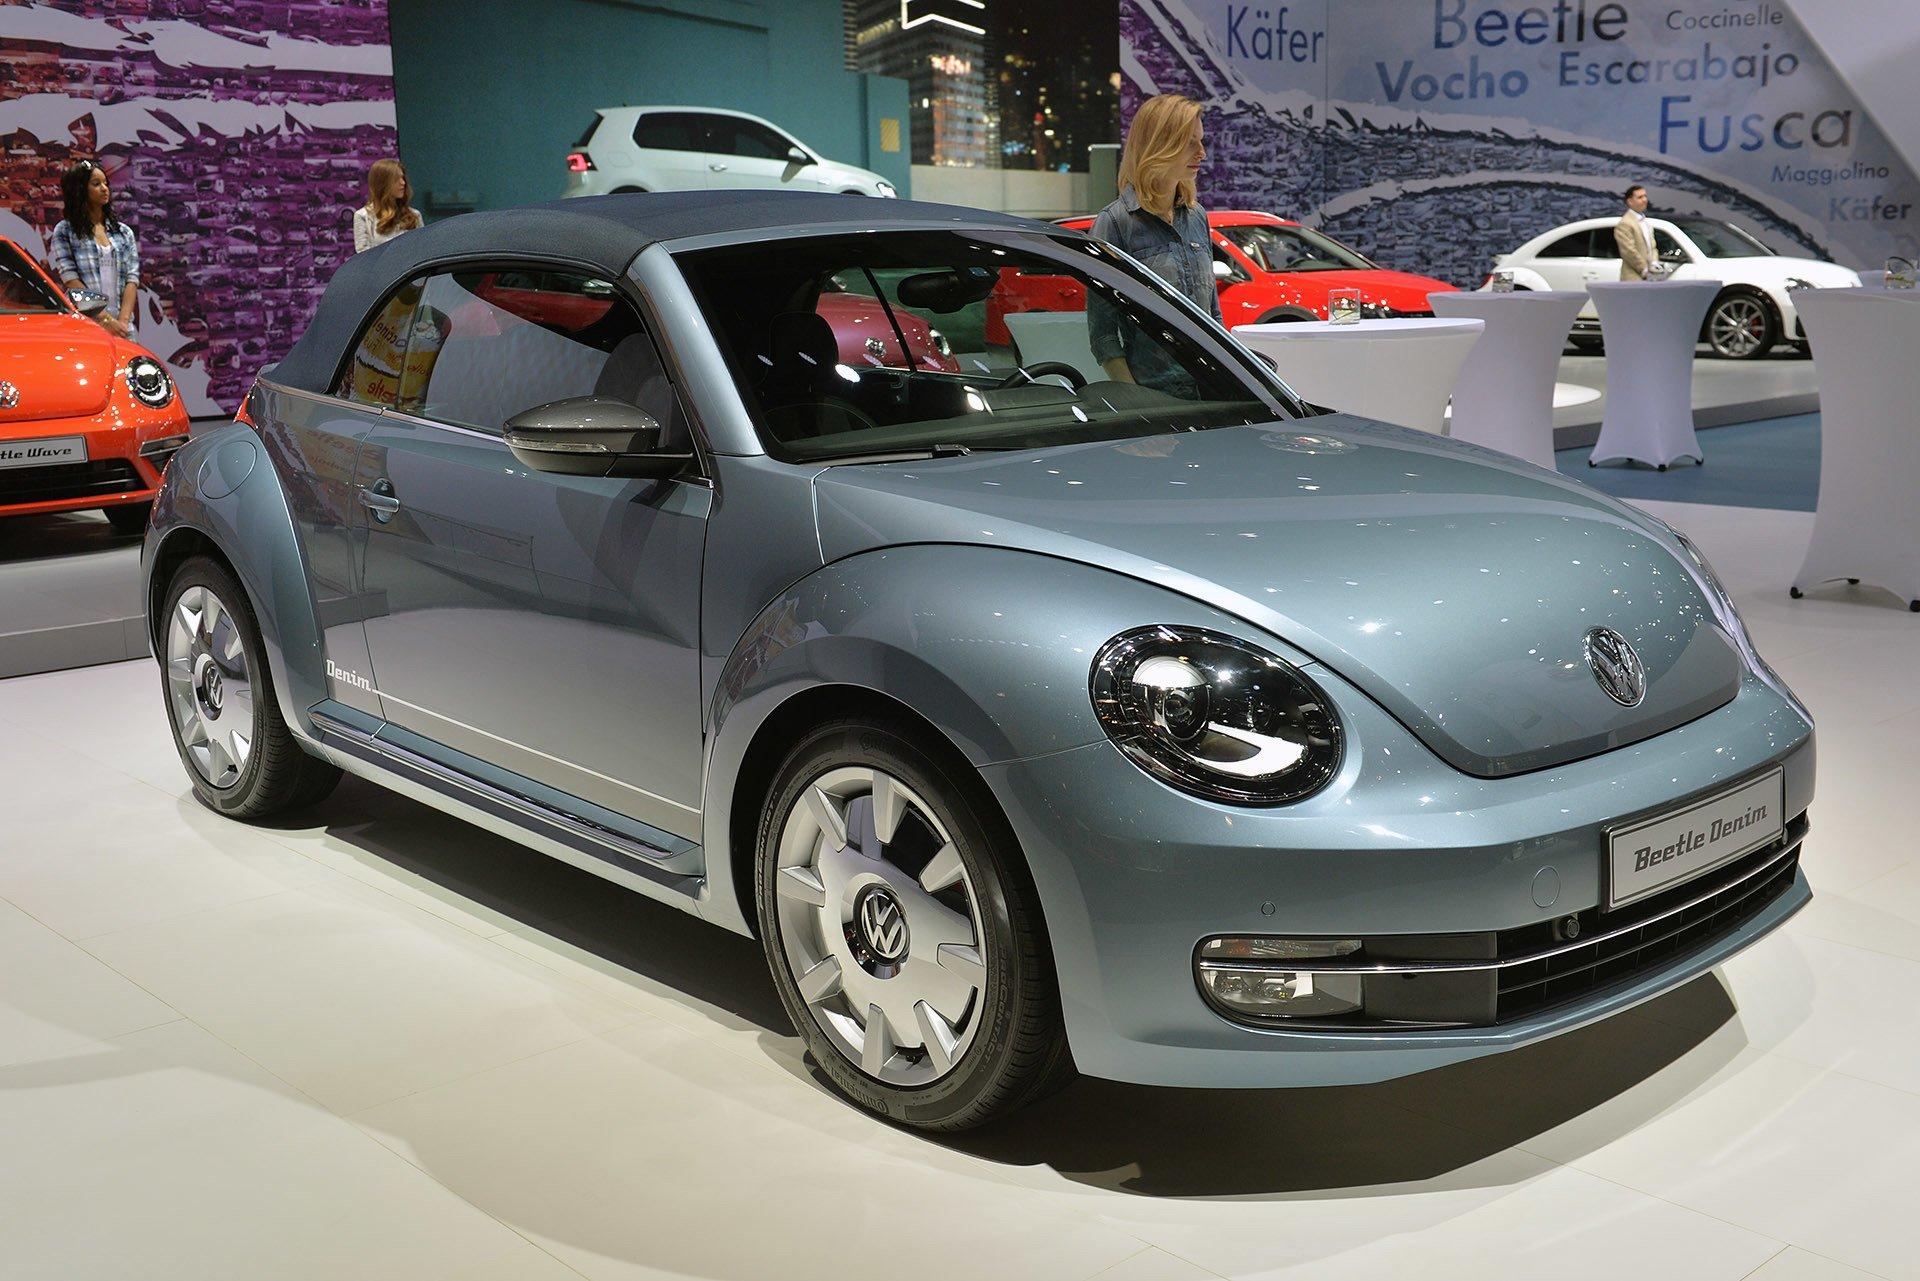 volkswagen beetle special edition concepts 2015 dark cars wallpapers. Black Bedroom Furniture Sets. Home Design Ideas